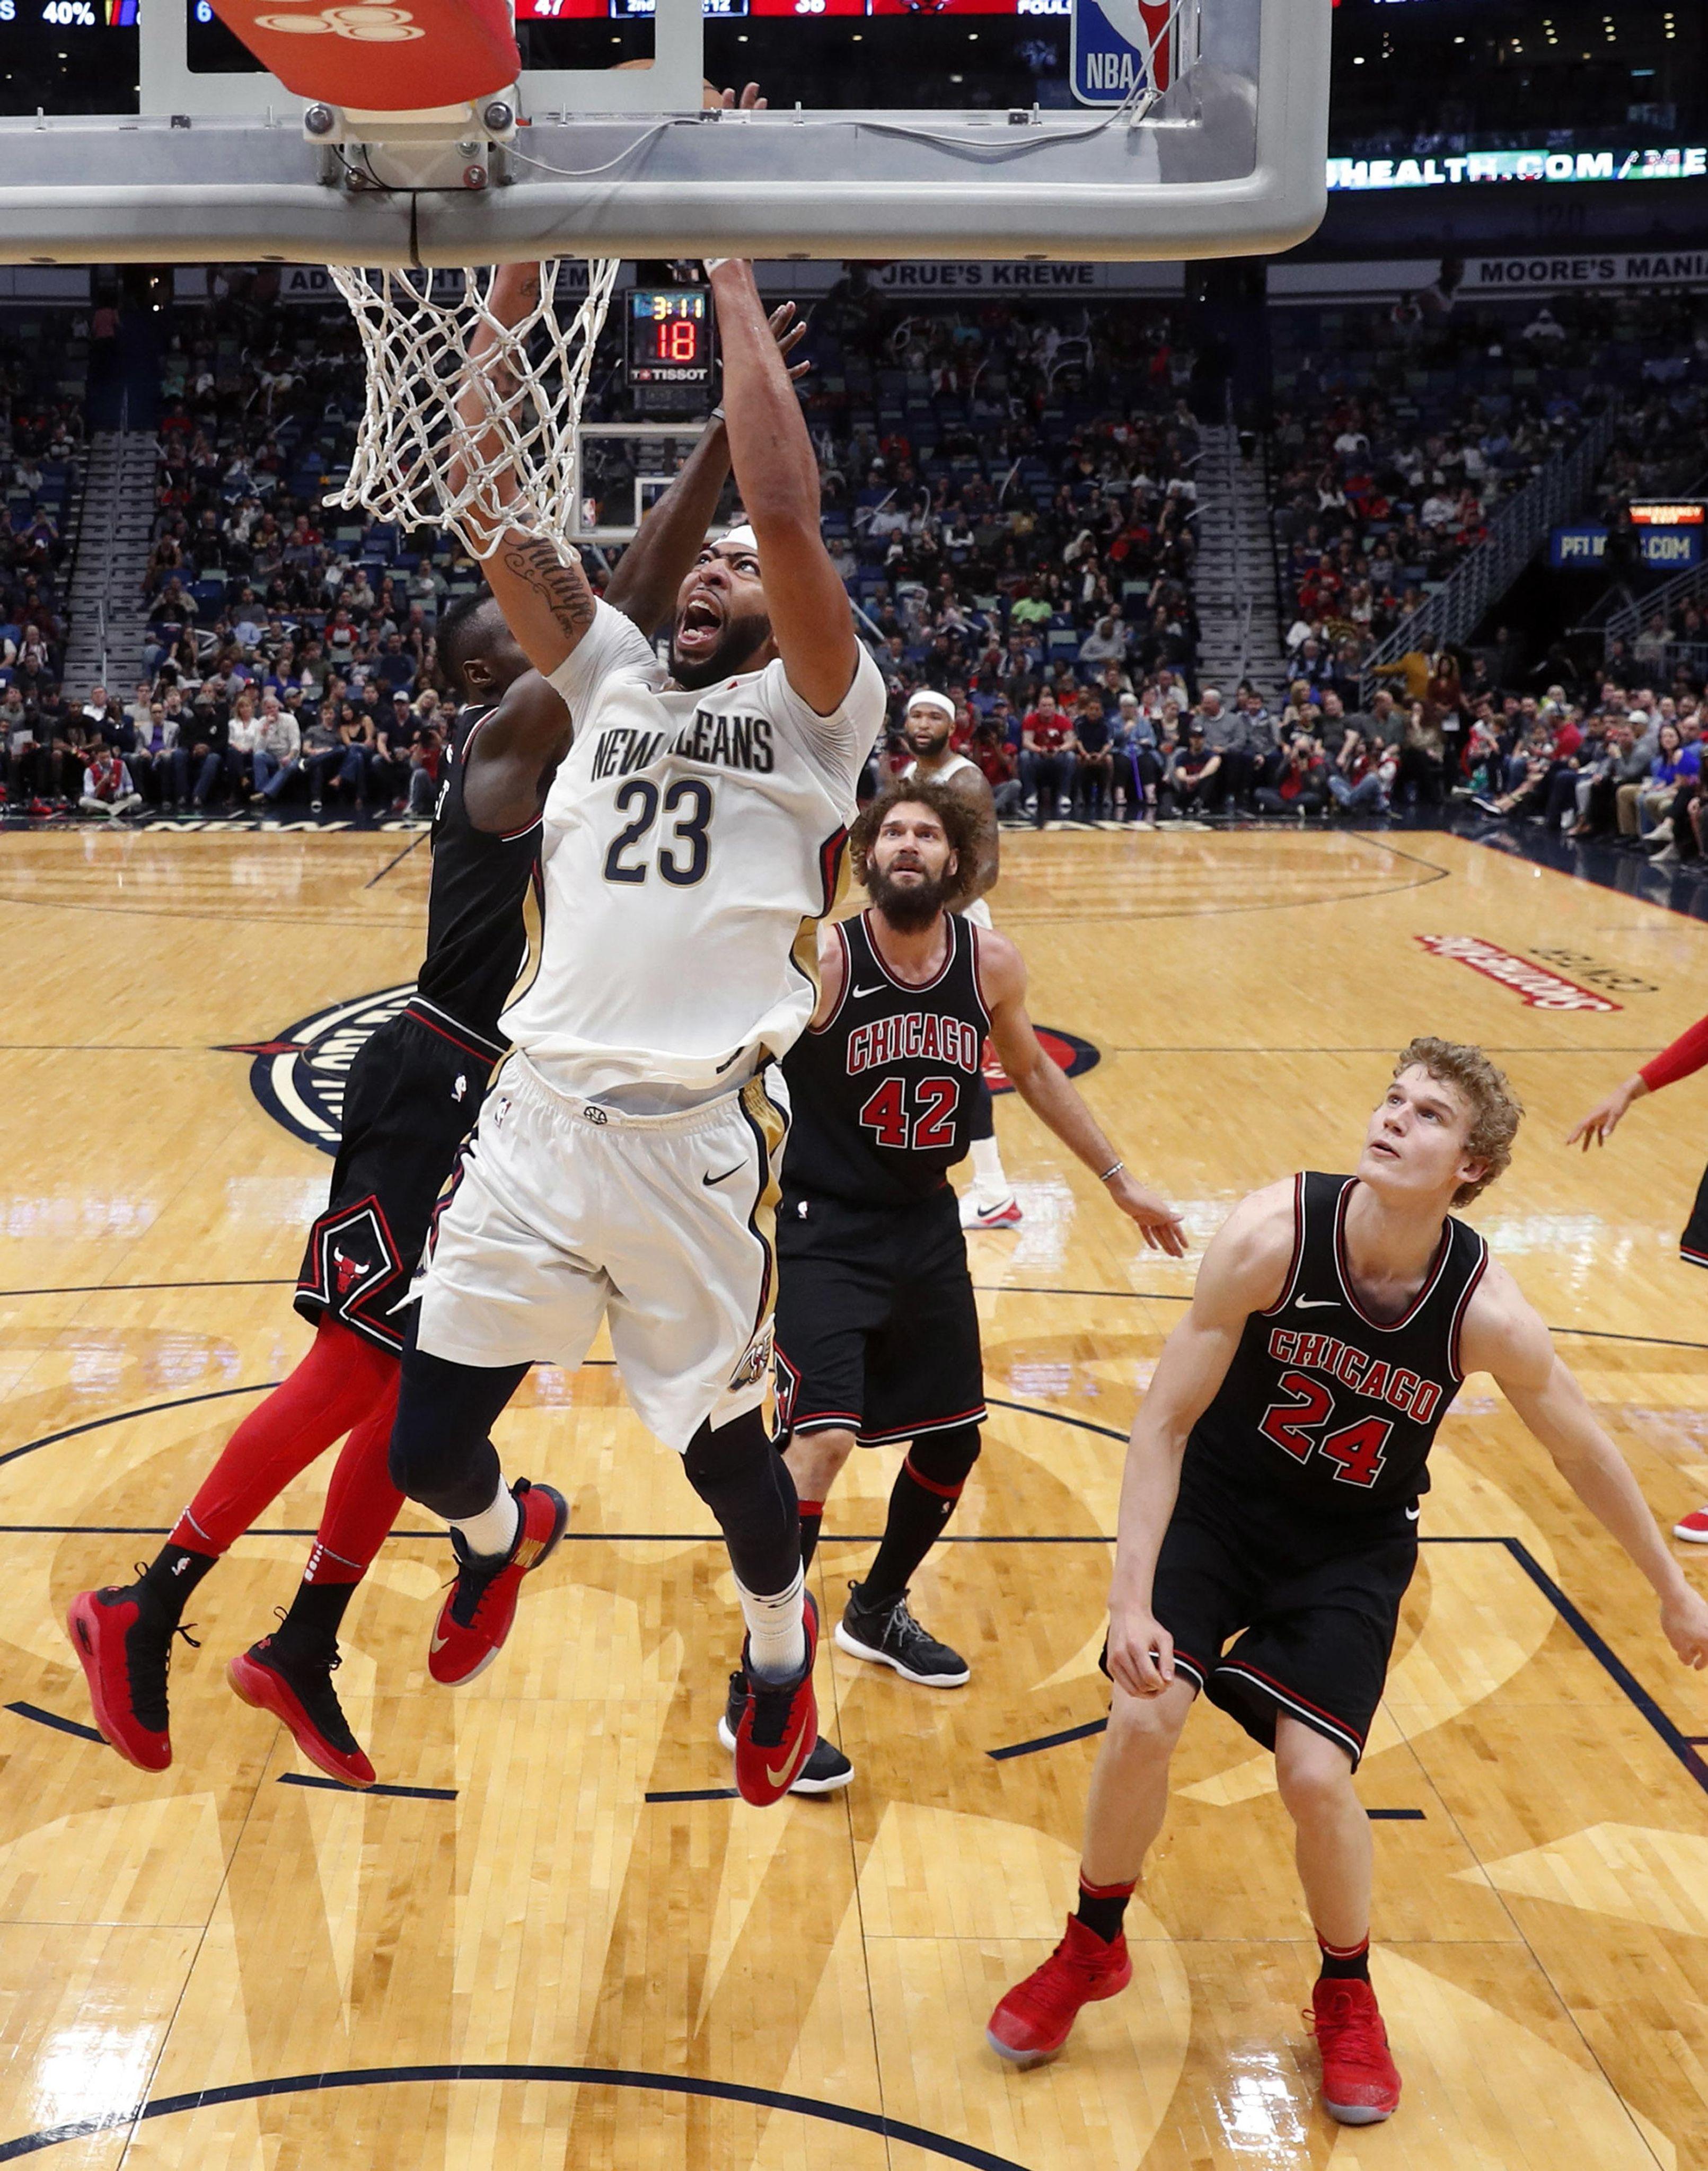 Bulls_pelicans_basketball_24410_s3222x4096